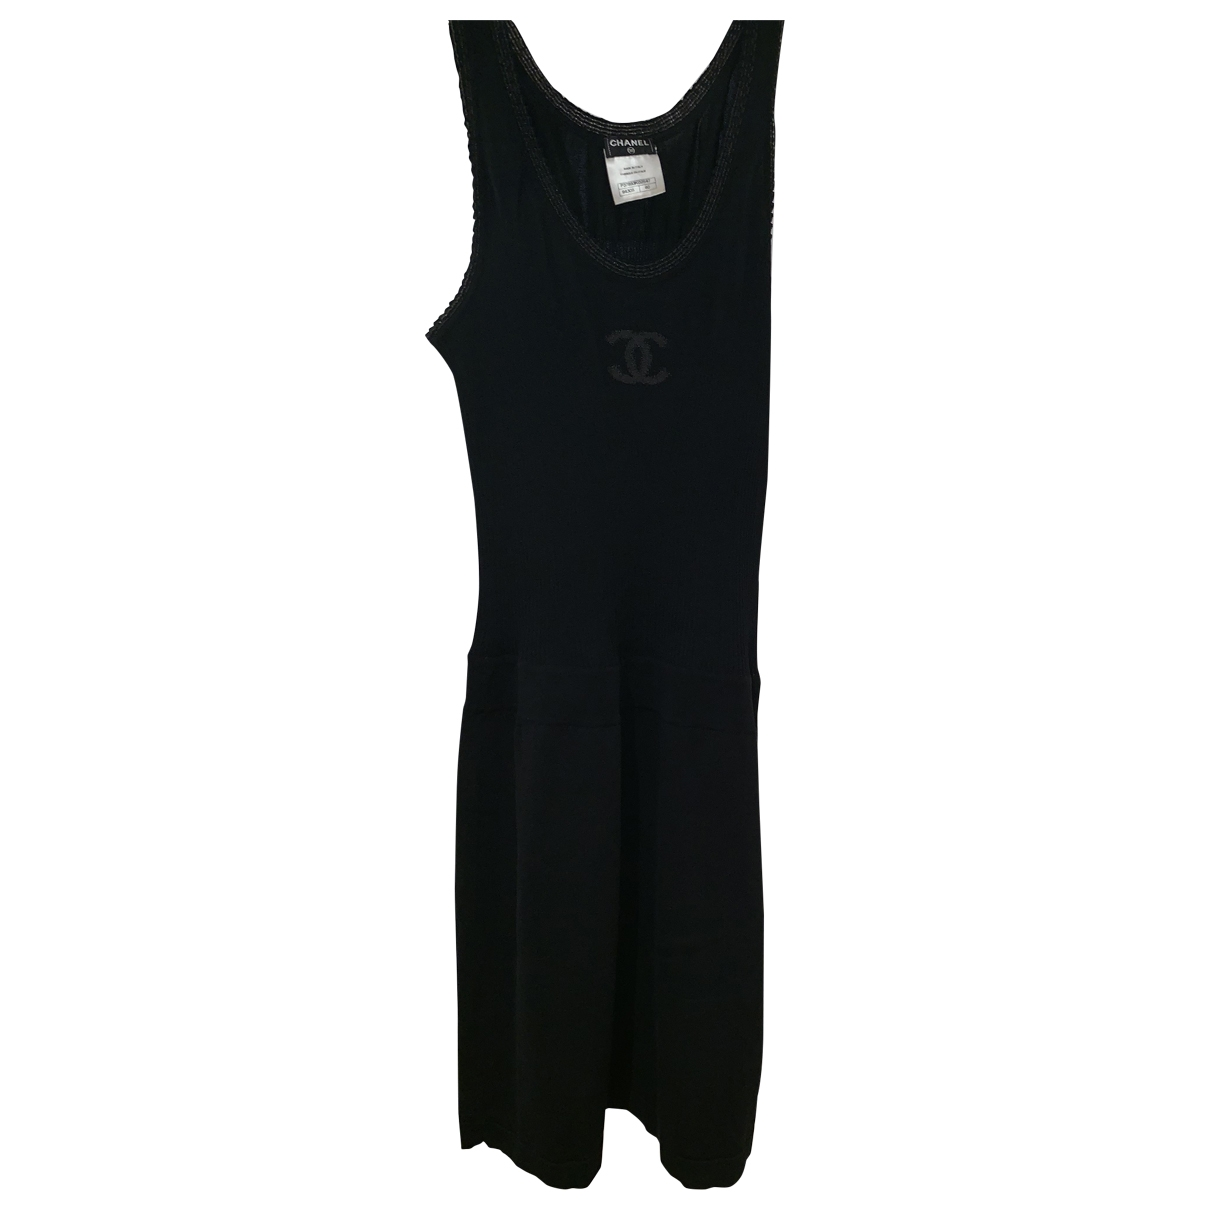 Chanel \N Black Cotton - elasthane dress for Women 42 FR